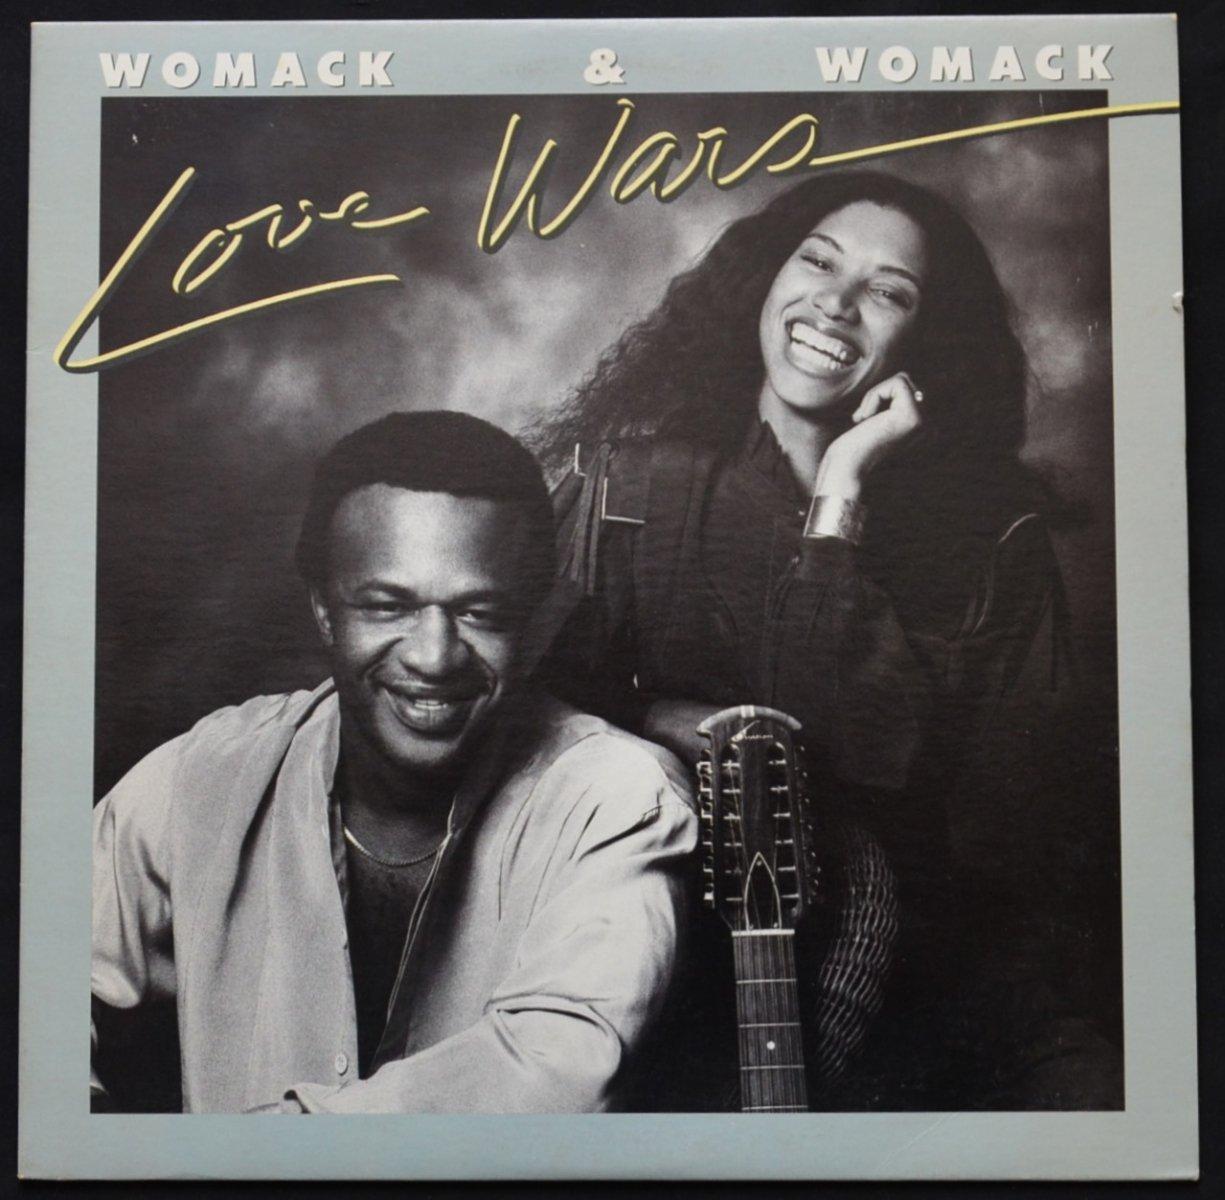 WOMACK & WOMACK / LOVE WARS (LP)